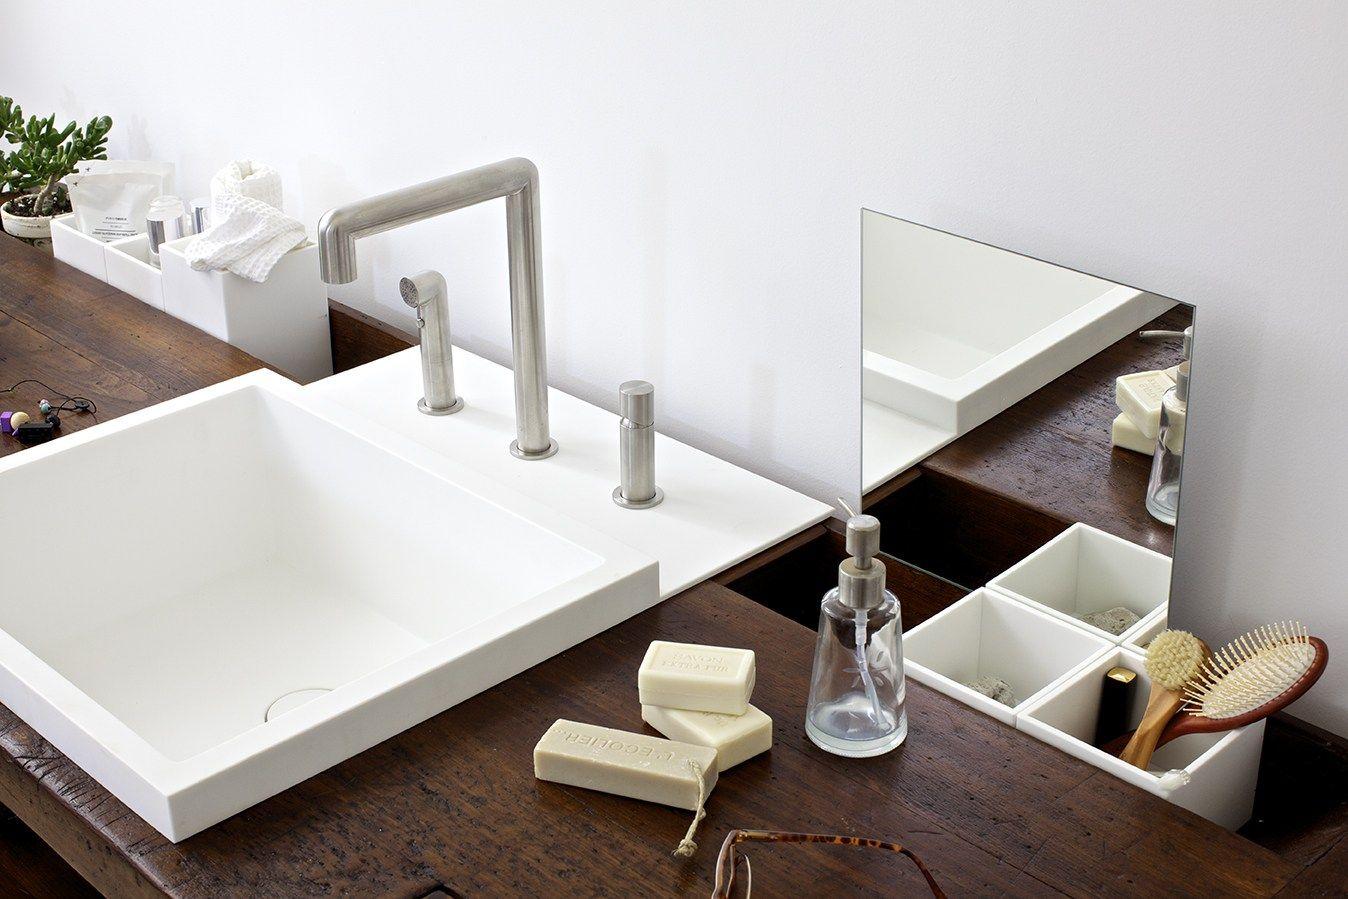 Waschtischunterschrank aus holz taul by rexa design design for Design waschtischunterschrank